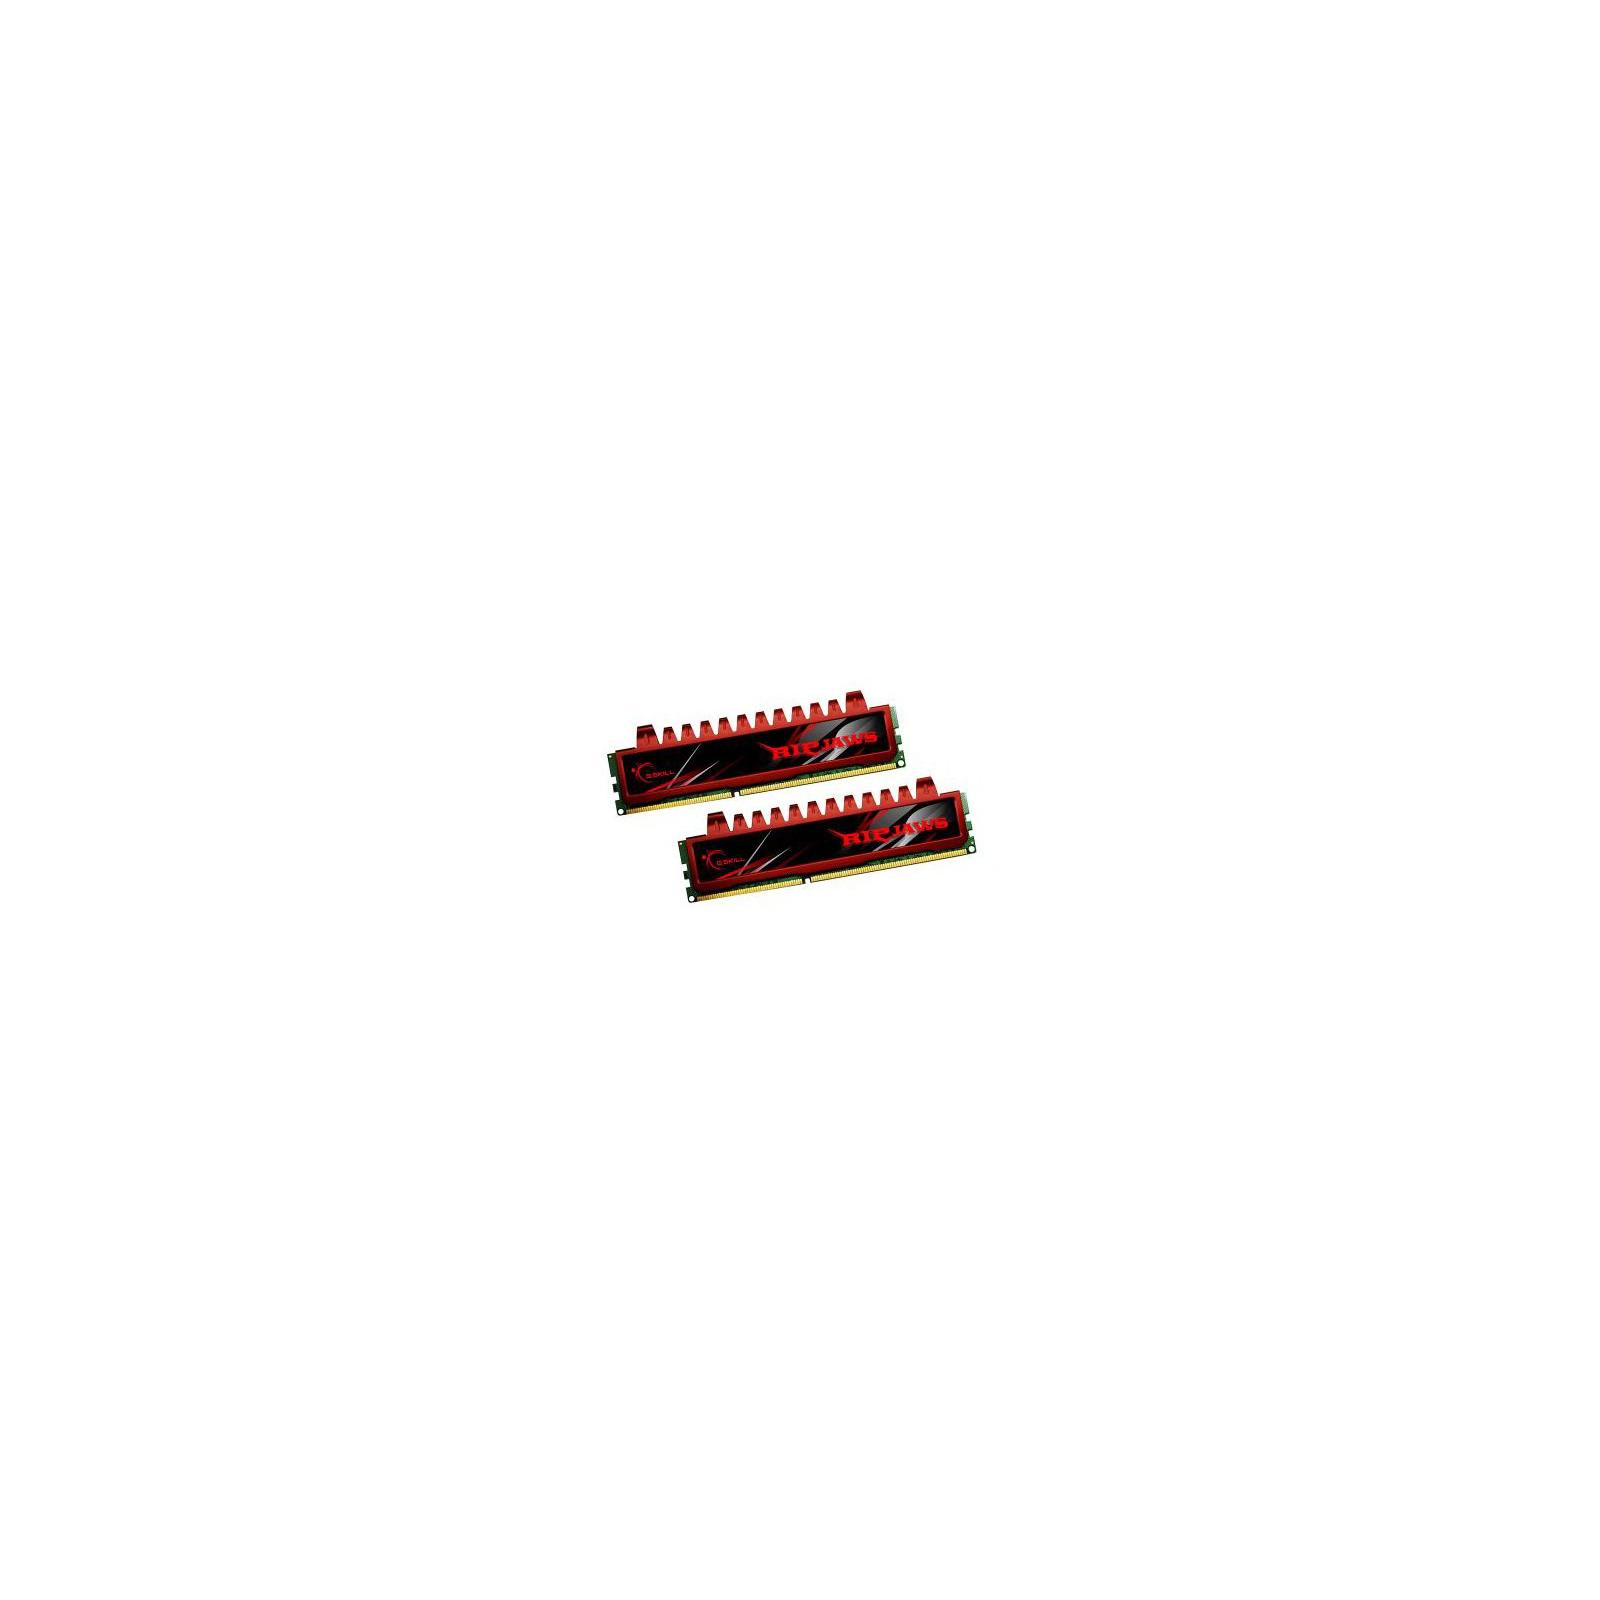 Модуль памяти для компьютера DDR3 8GB (2x4GB) 1333 MHz G.Skill (F3-10666CL9D-8GBRL)